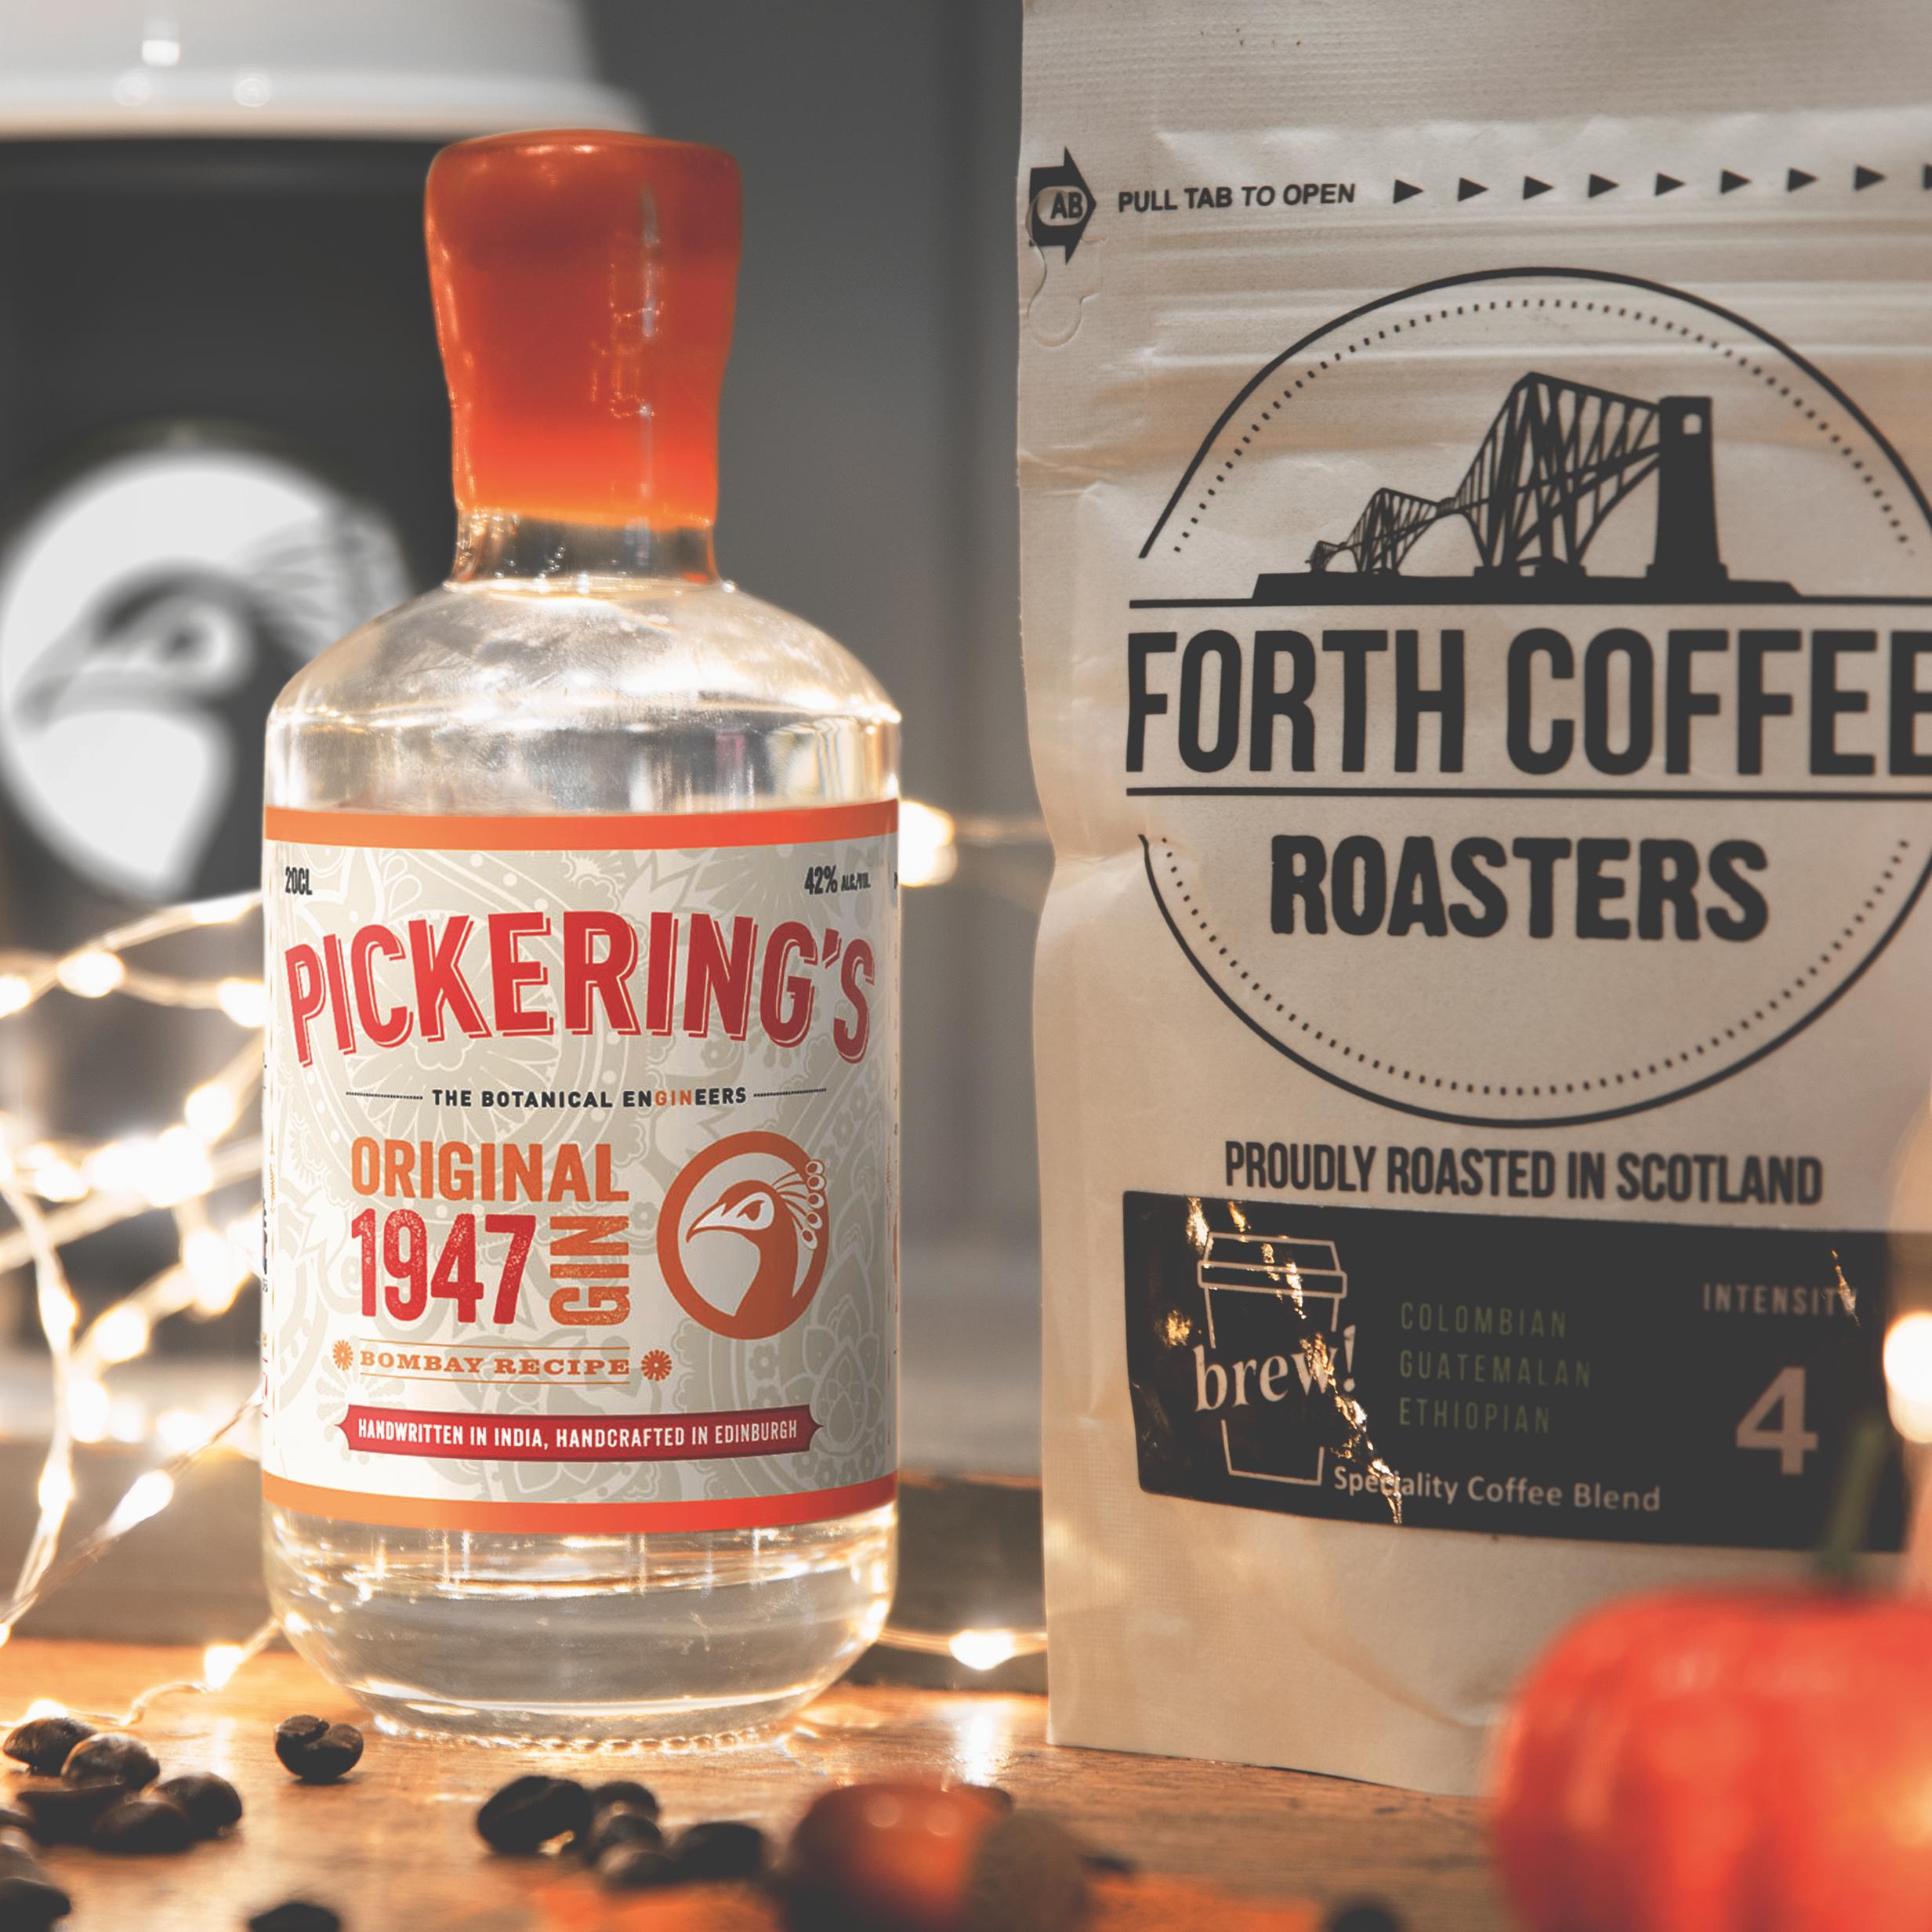 Pickering's 1947 Gin